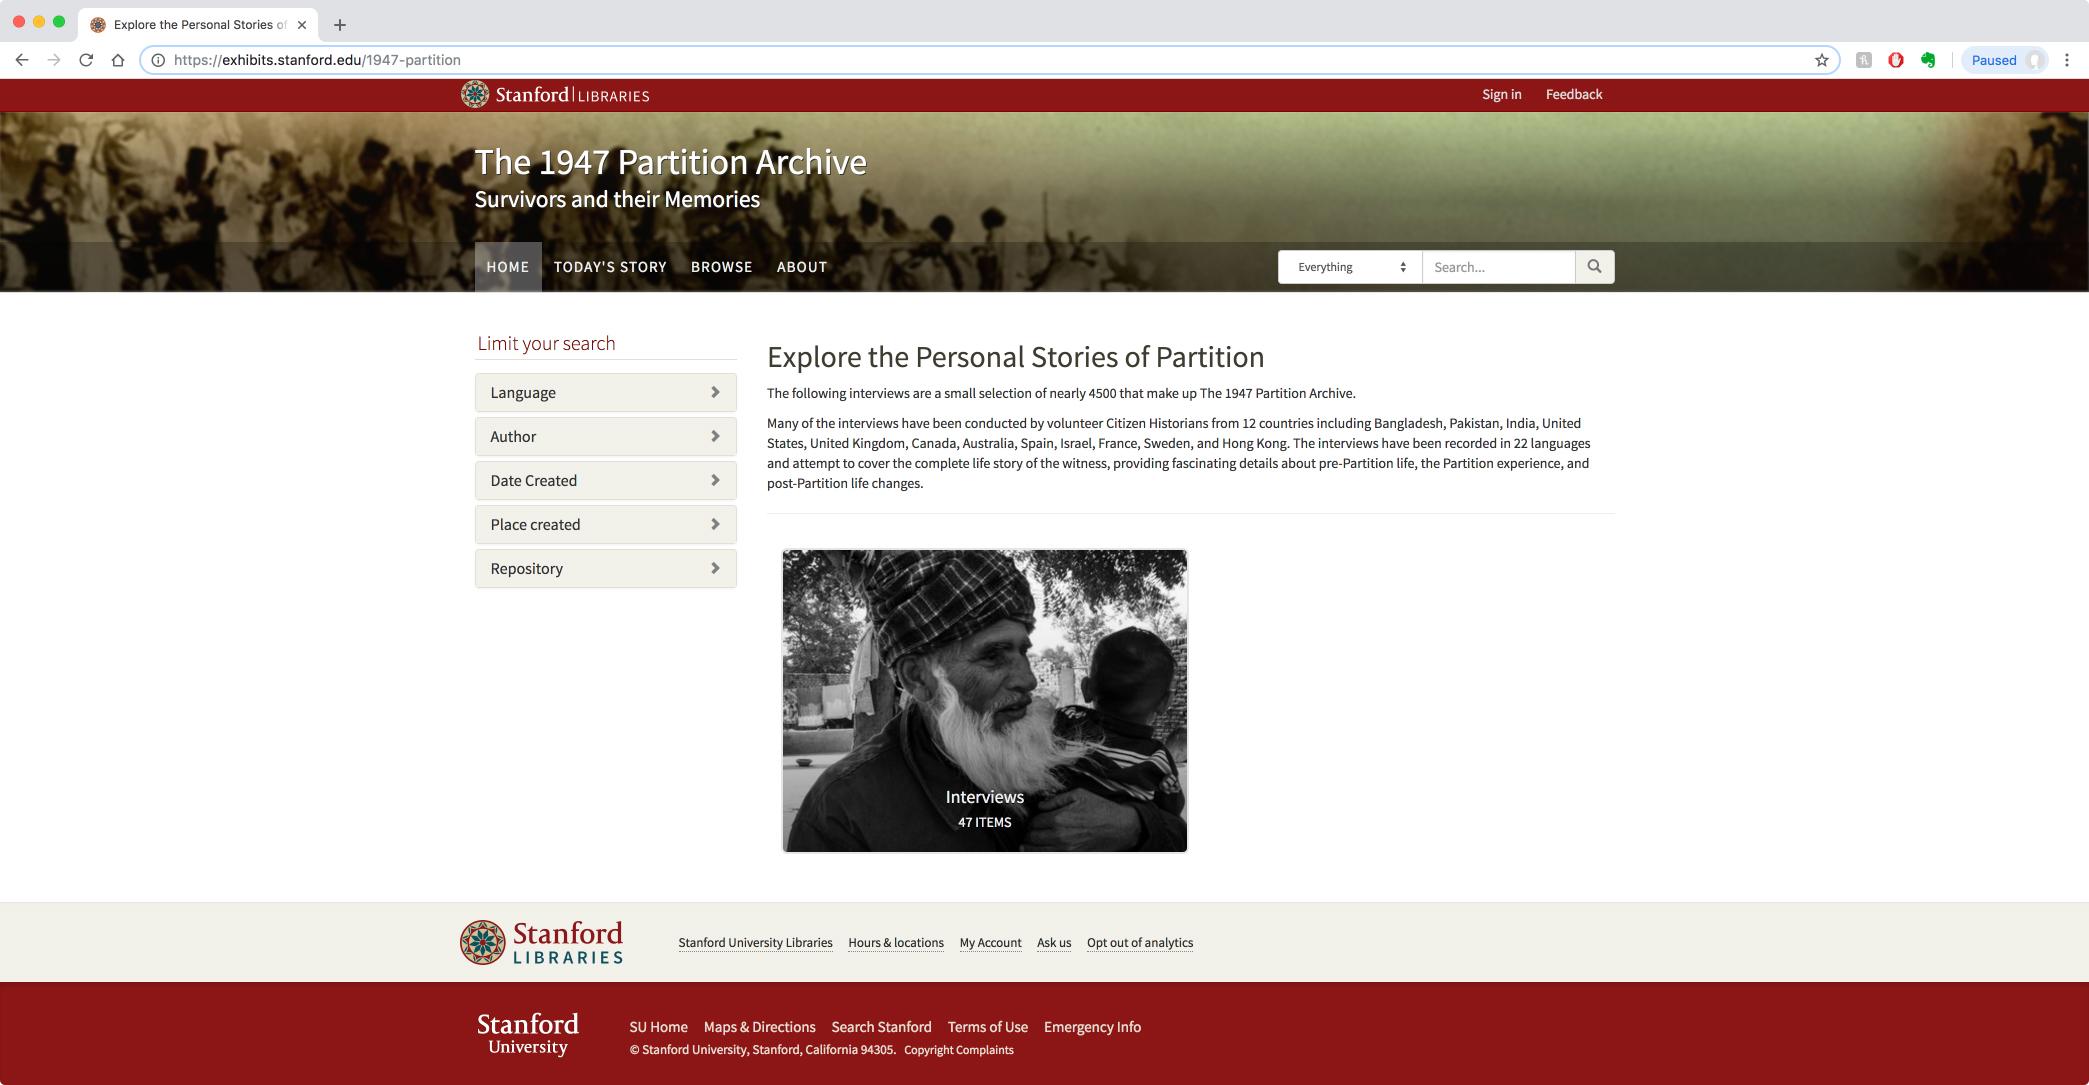 Stanford University's 1947 Partition website.